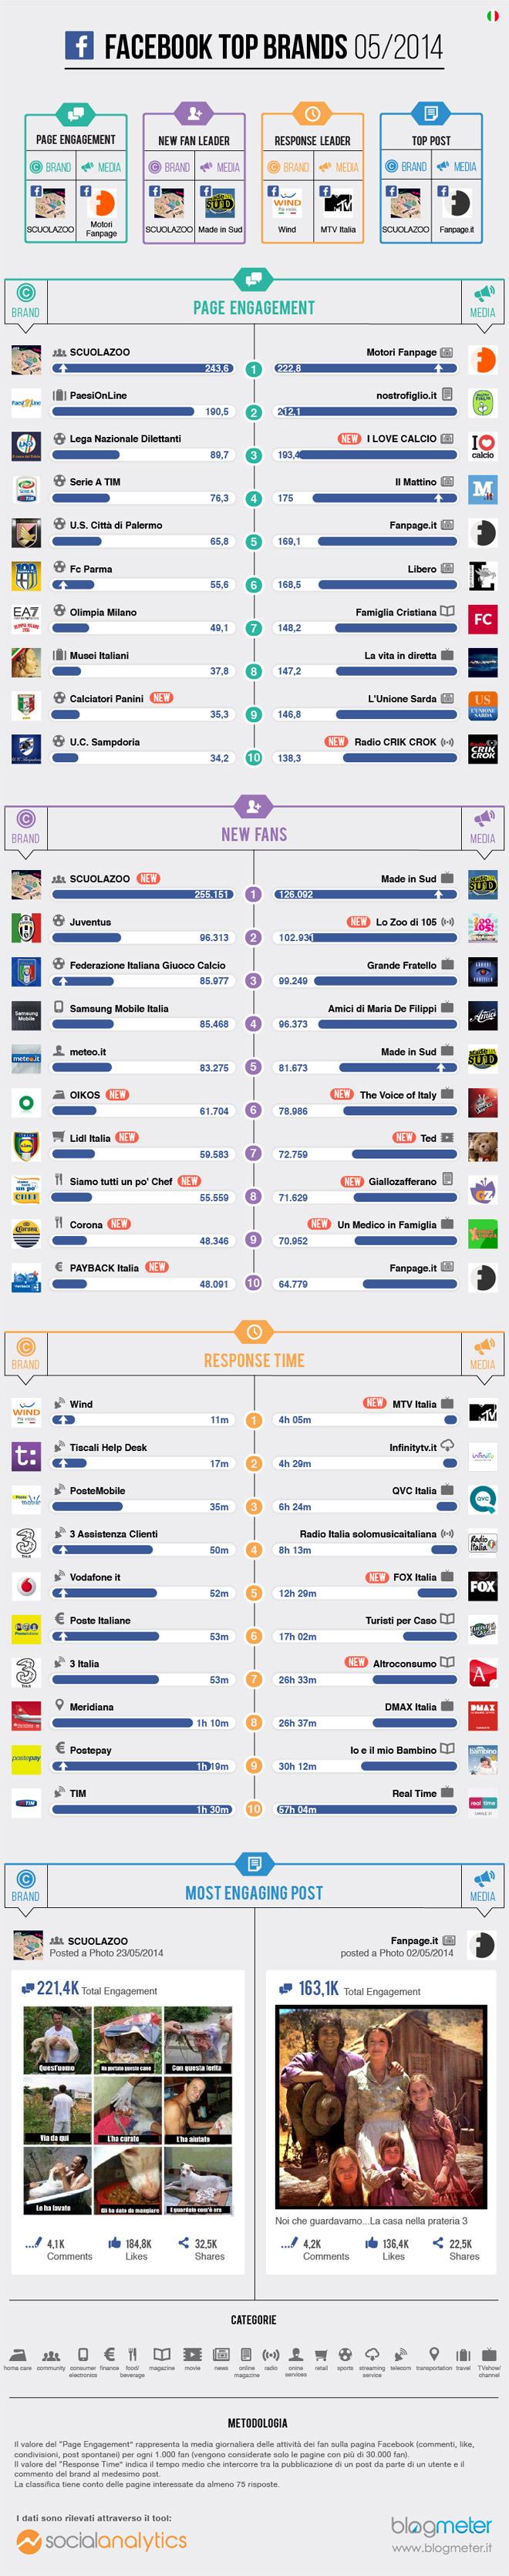 top-brands-facebook-maggio-2014-infografica